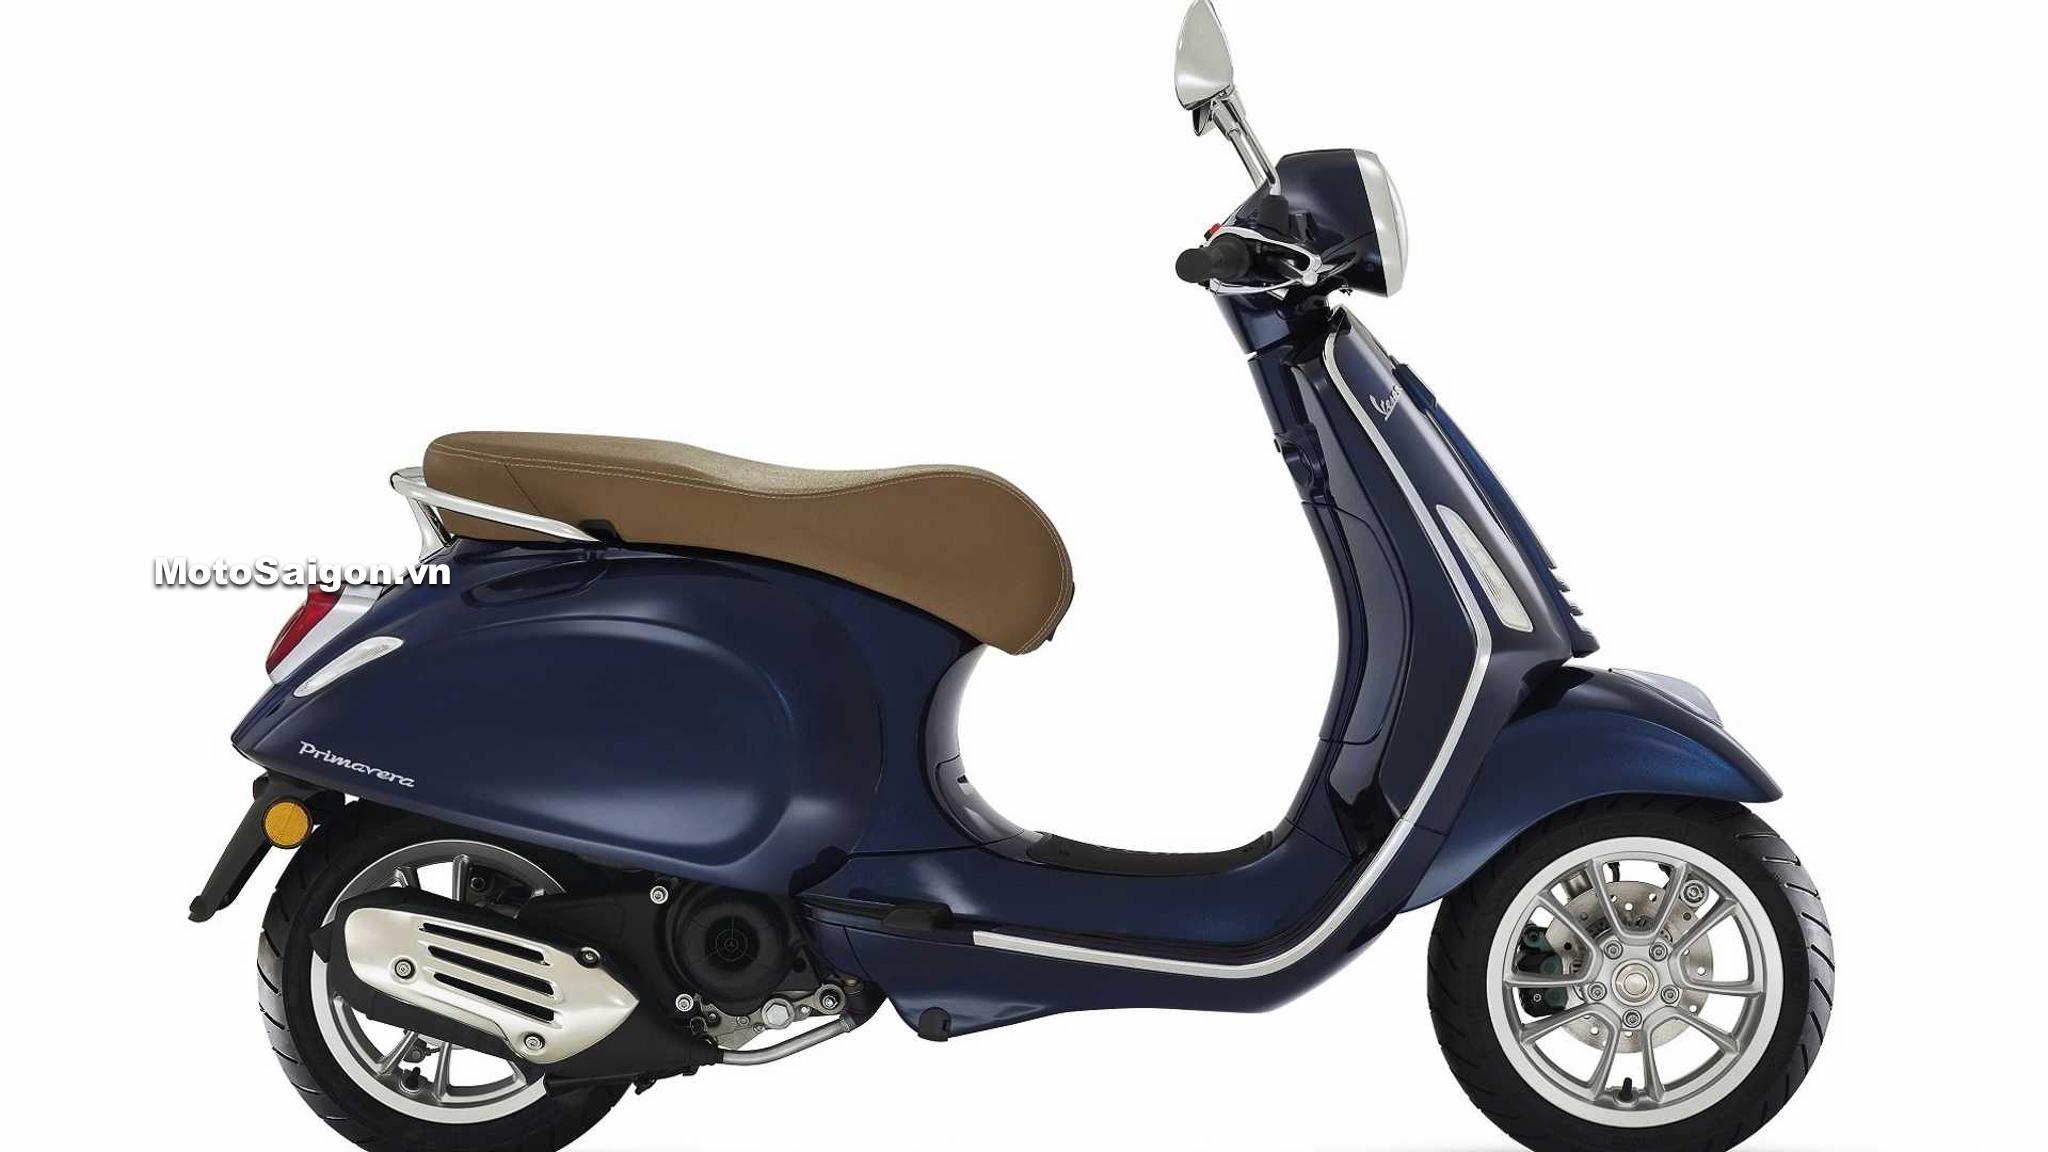 Vespa Primavera 50 Limited Speed